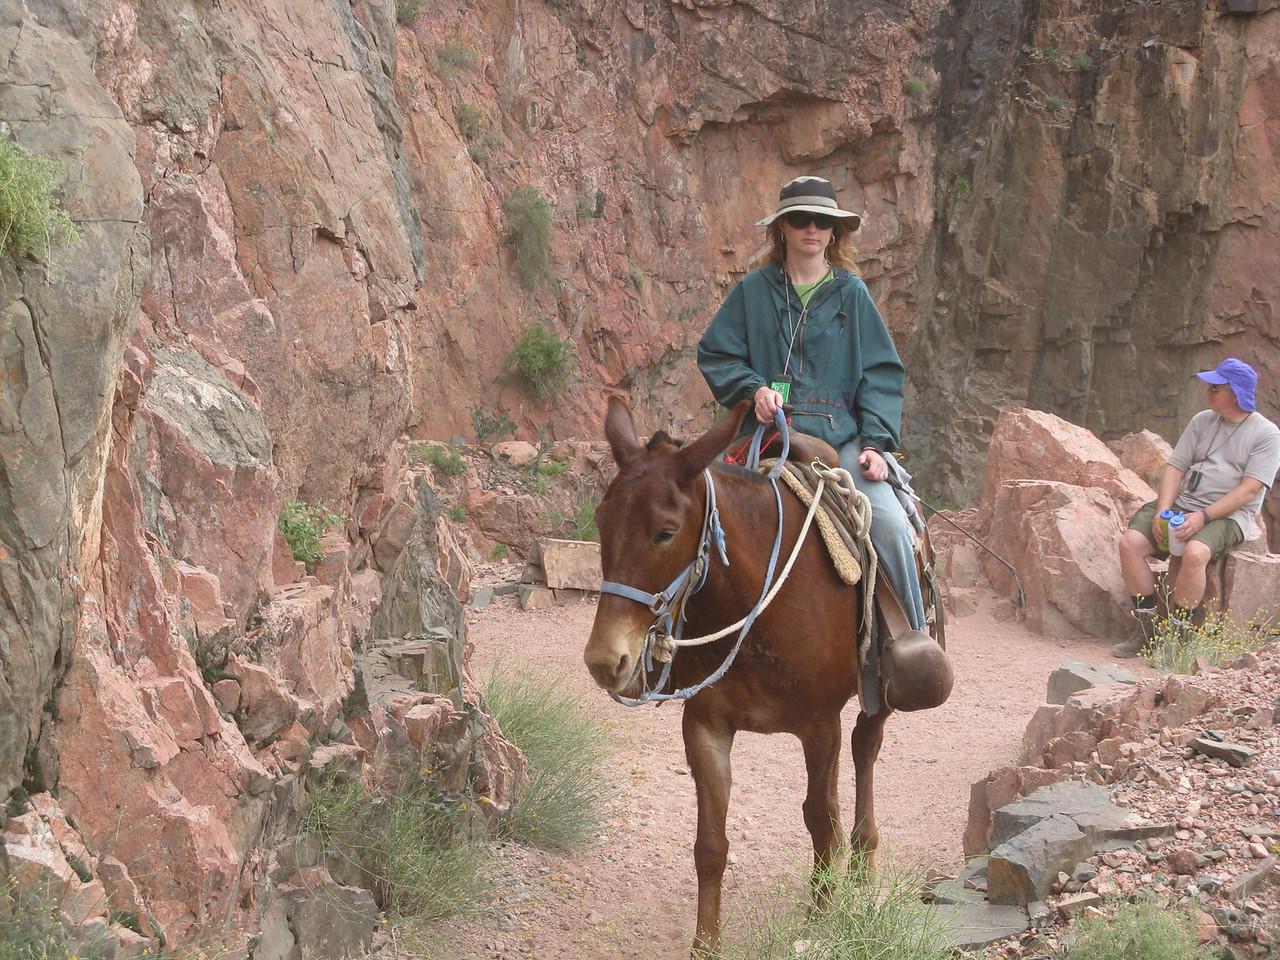 An auburn colored mule.